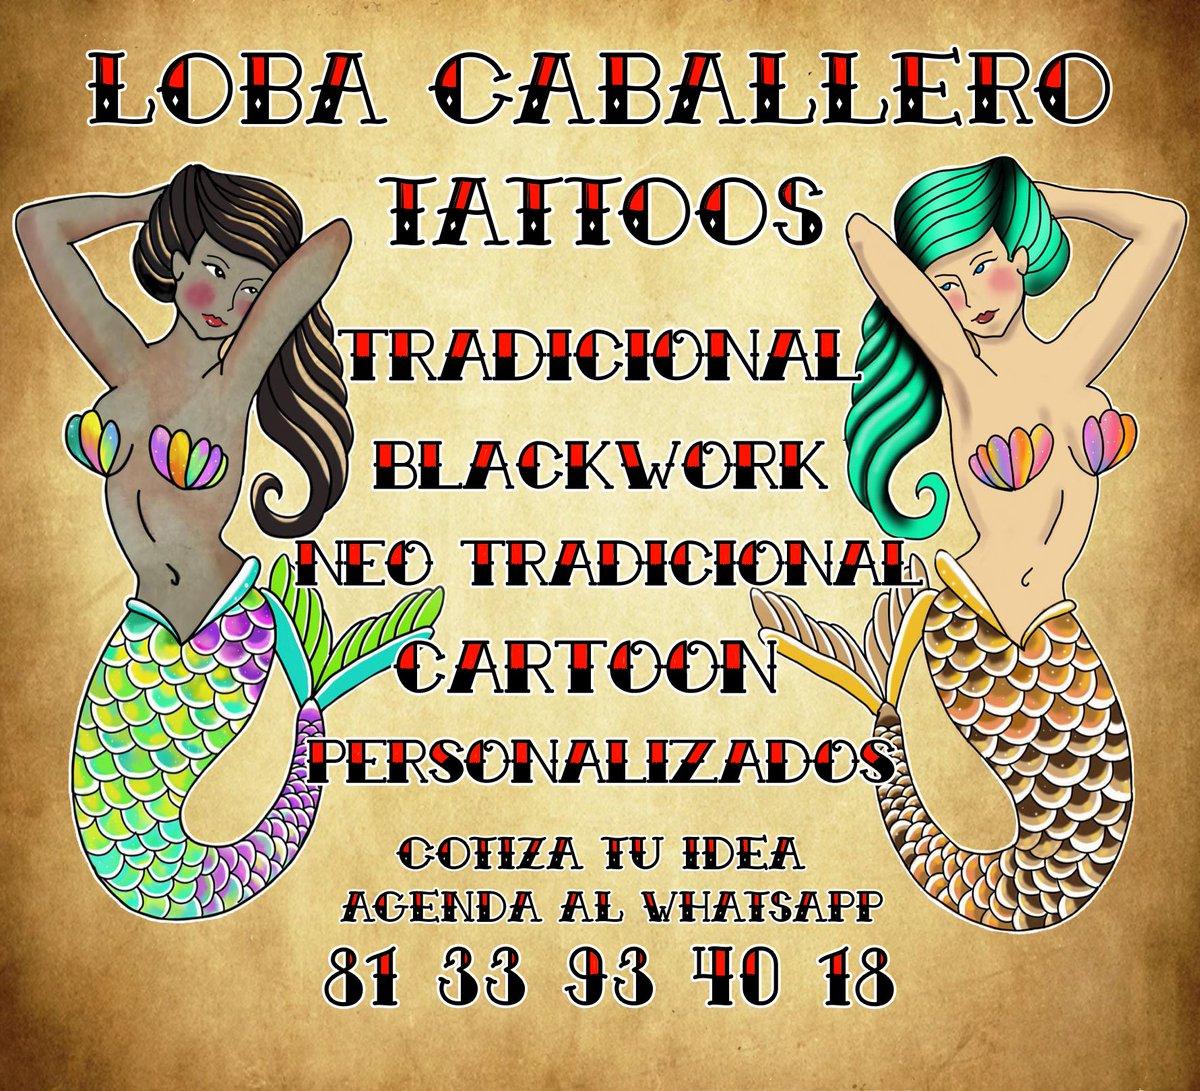 https://t.co/MnZLHMCEFr #custom #tattoos #monterrey #tatuajes #traditional #neotraditional #cartoontattoos #blackworktattoos https://t.co/IfDC2GtvHp